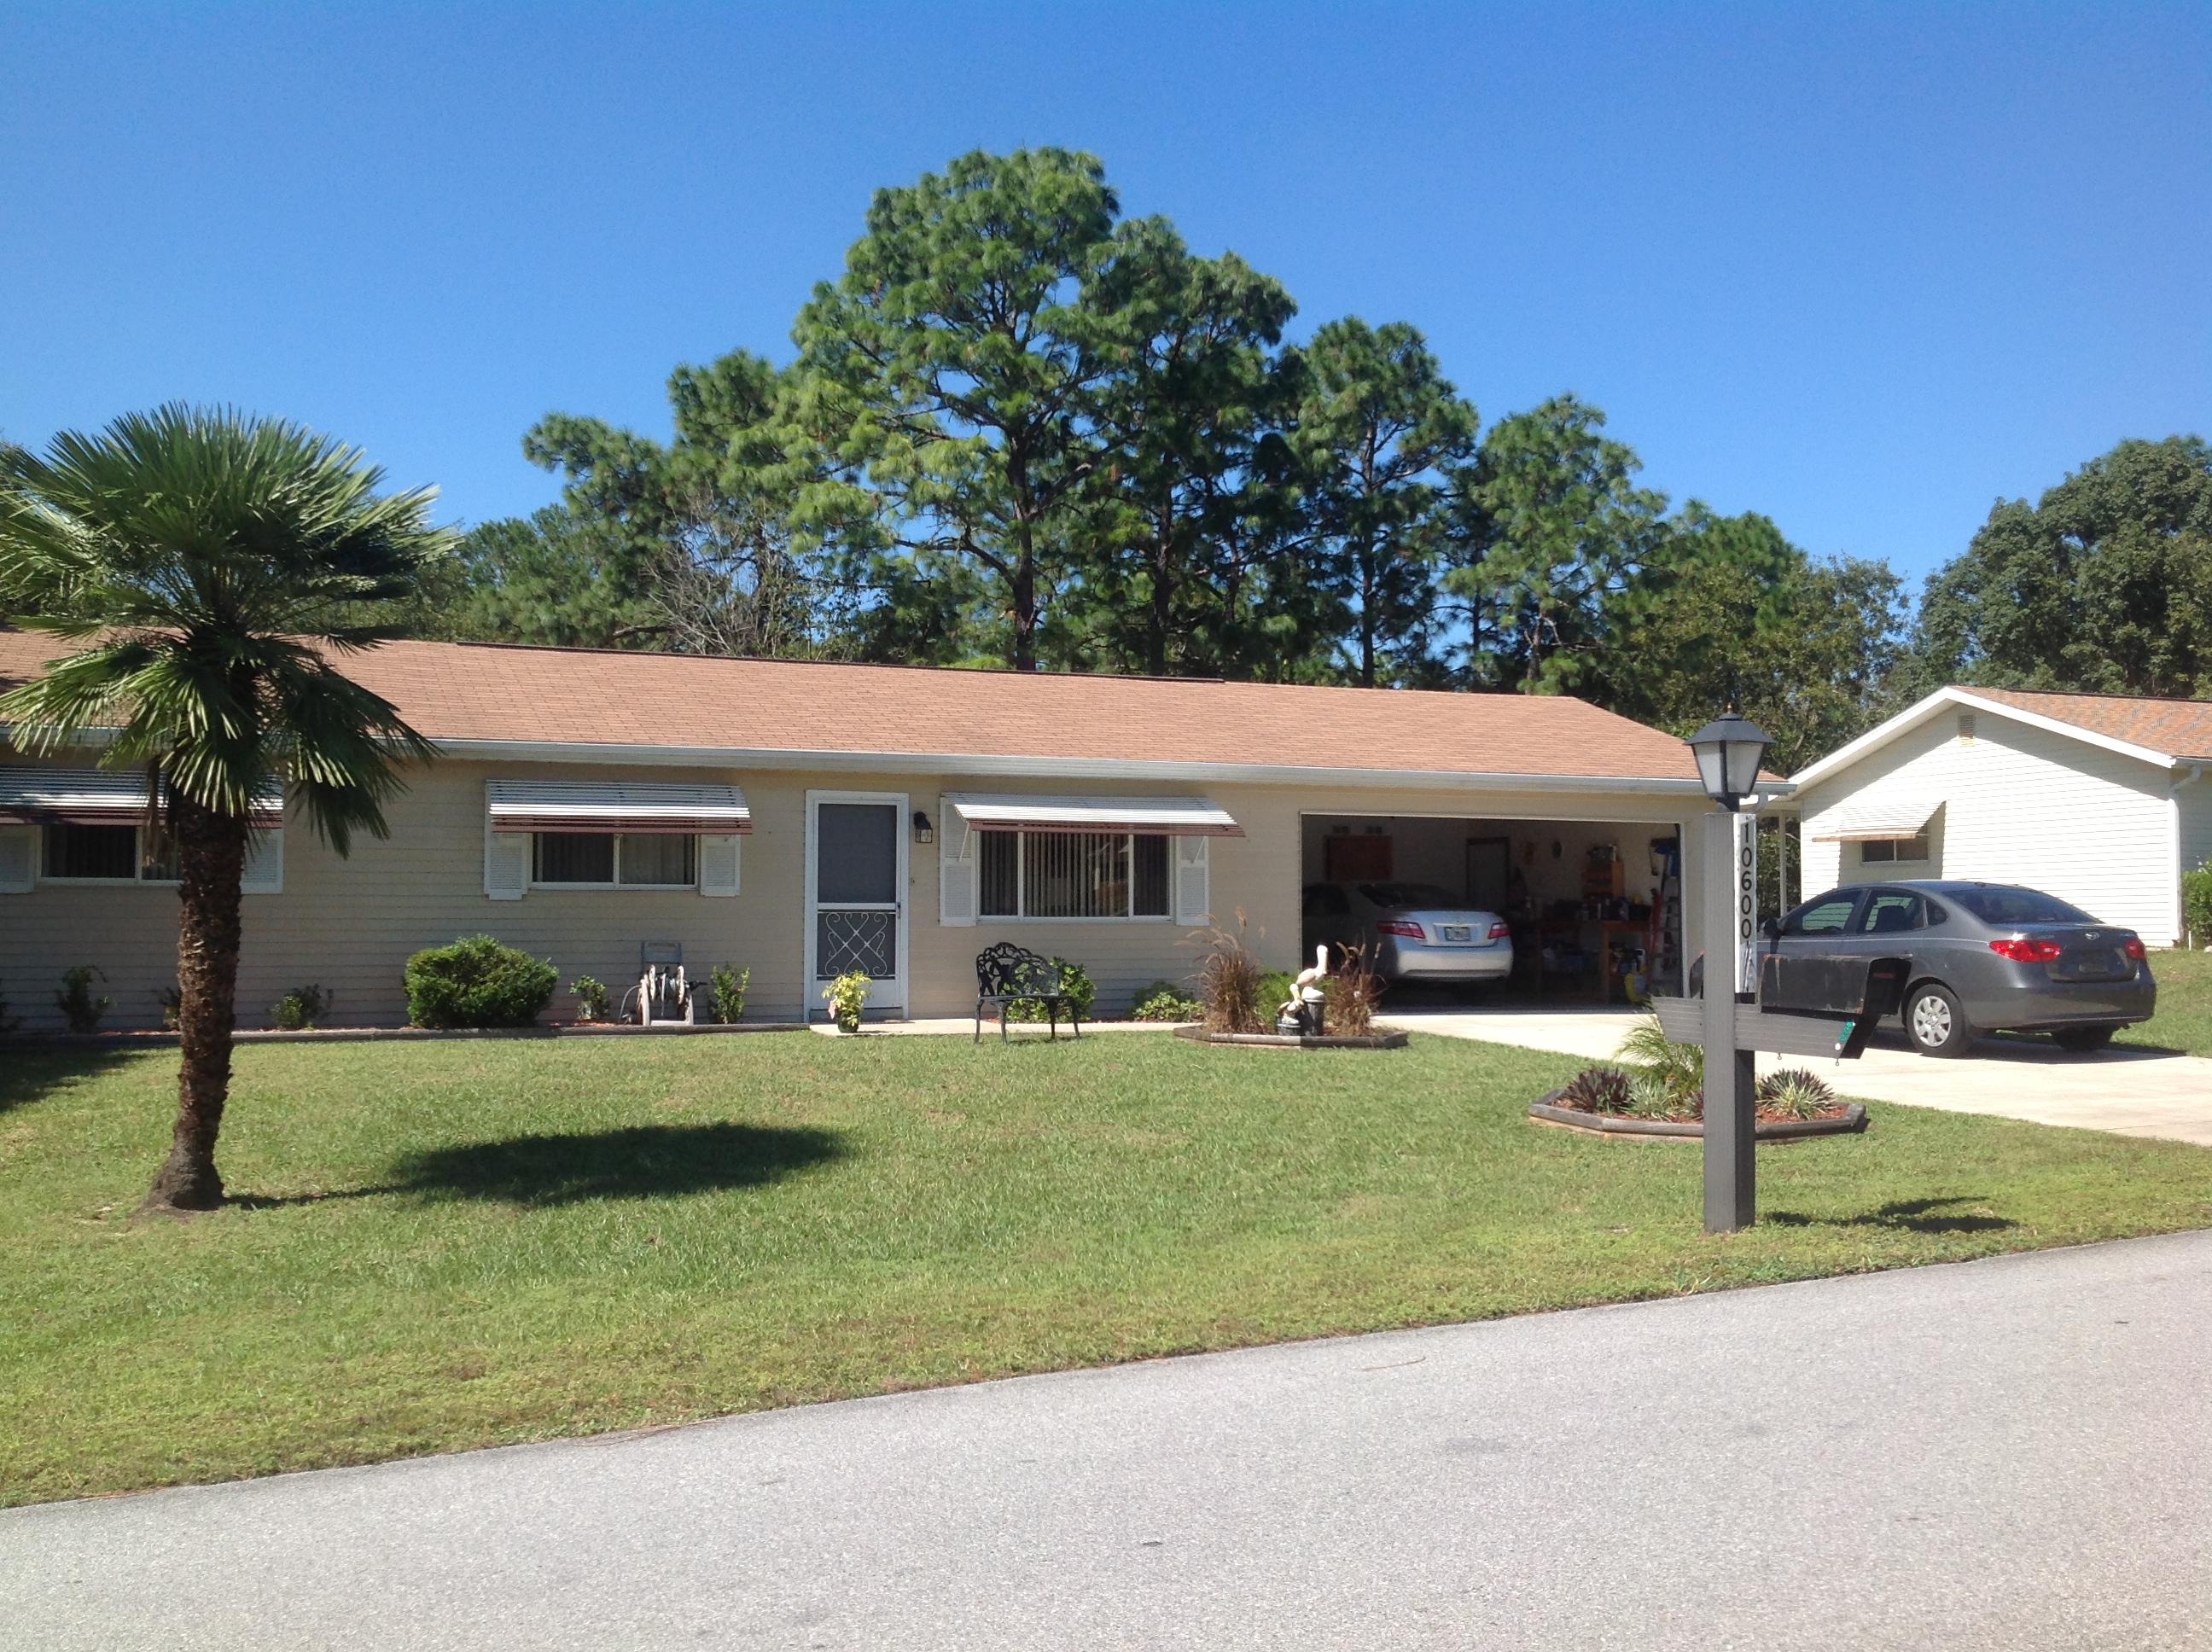 Houses For Rent Ocala Fl Houses For Sale Ocala Florida 301